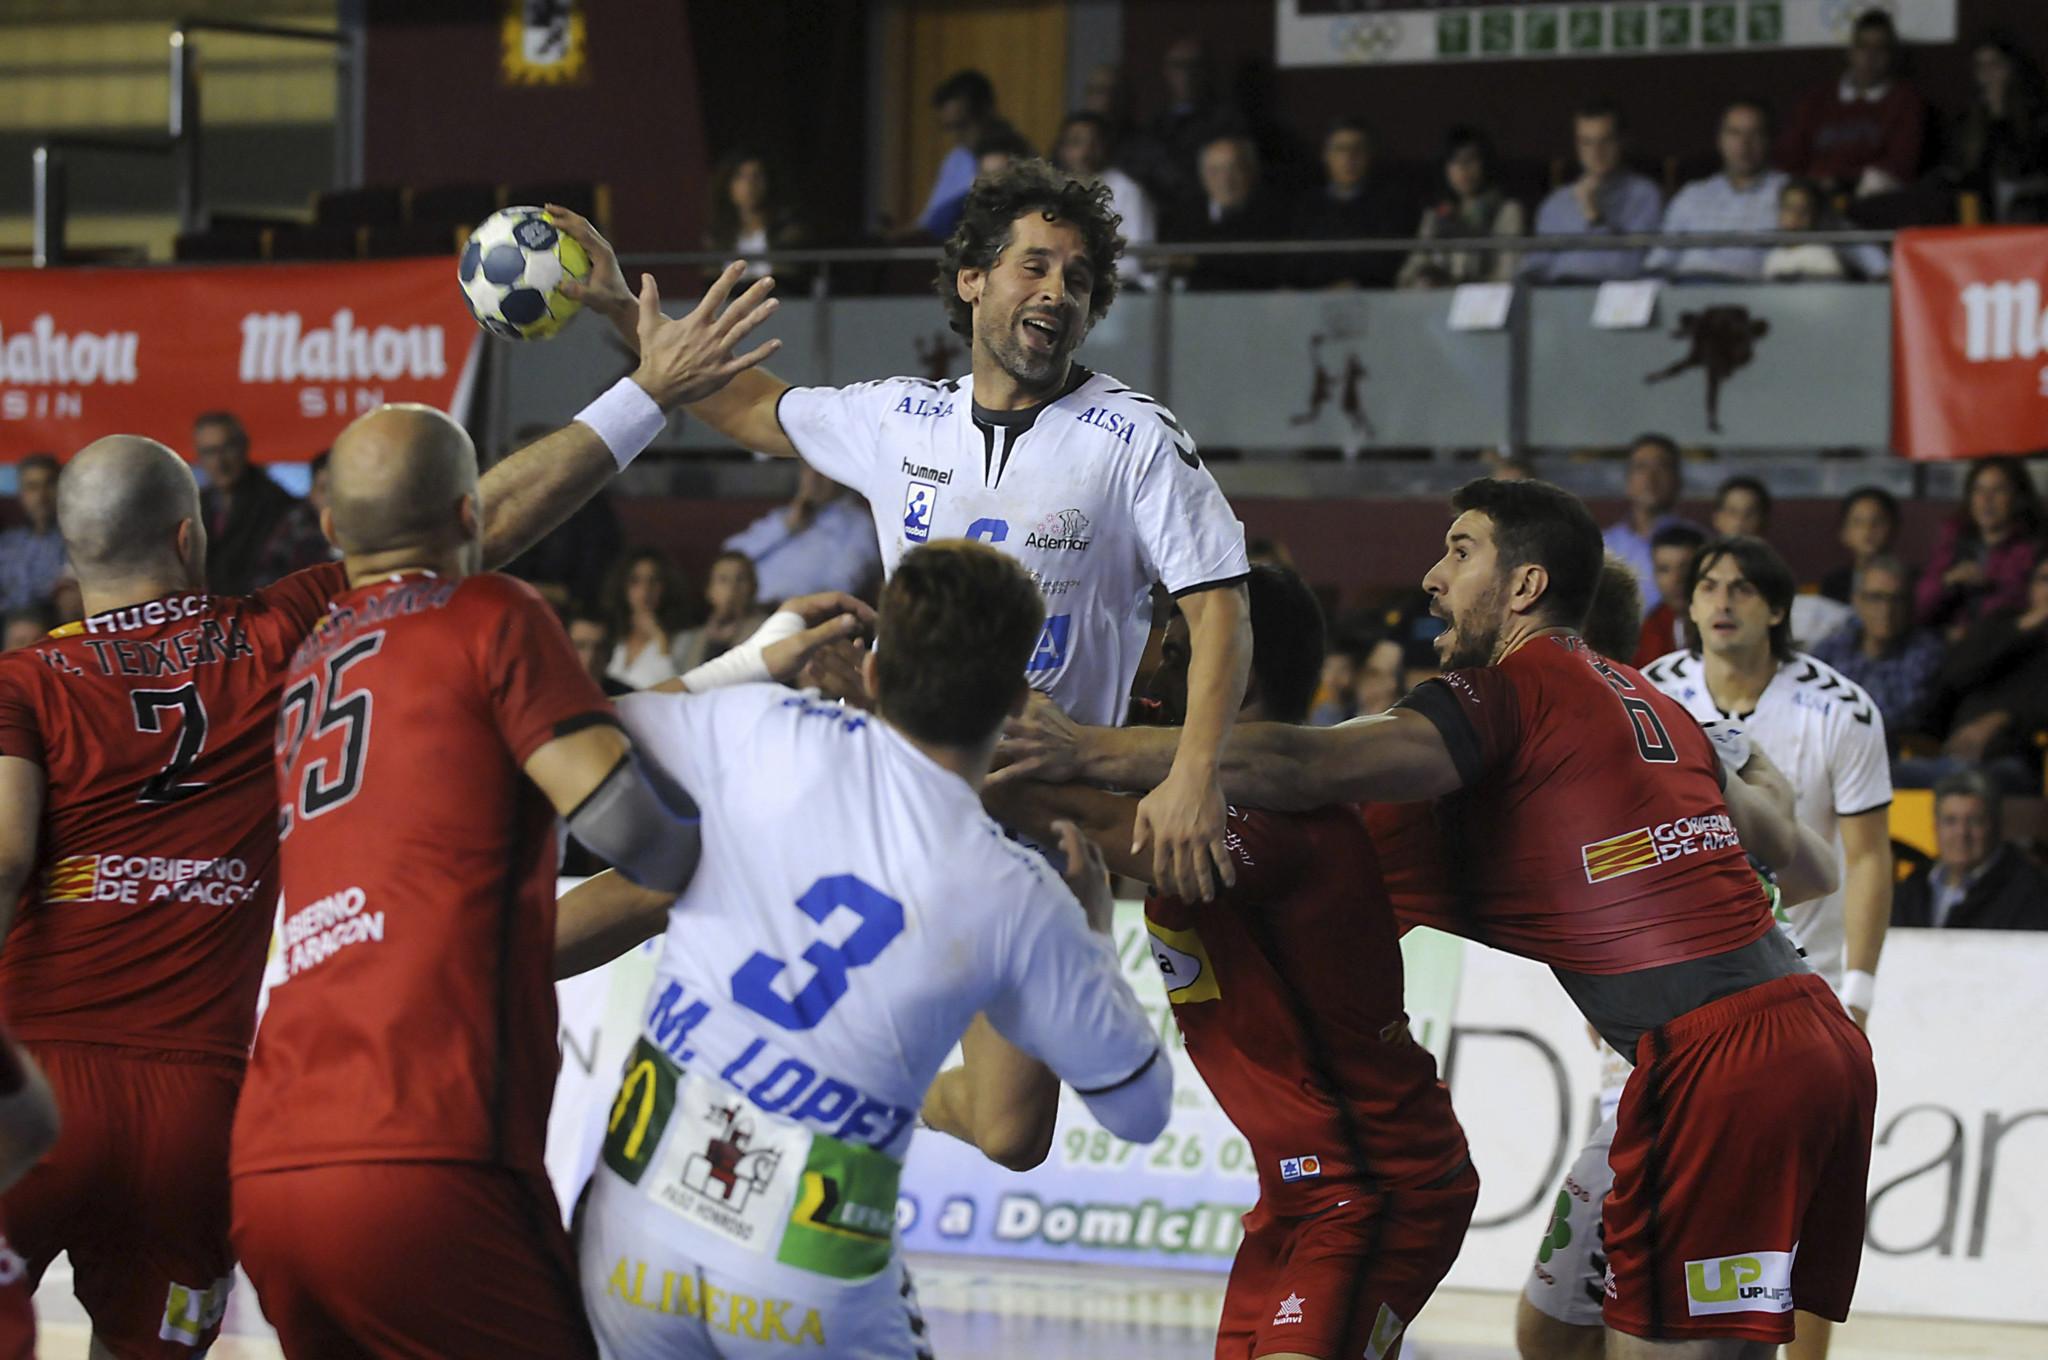 Liga Asobal 2016/17 - Página 11 14765578828365